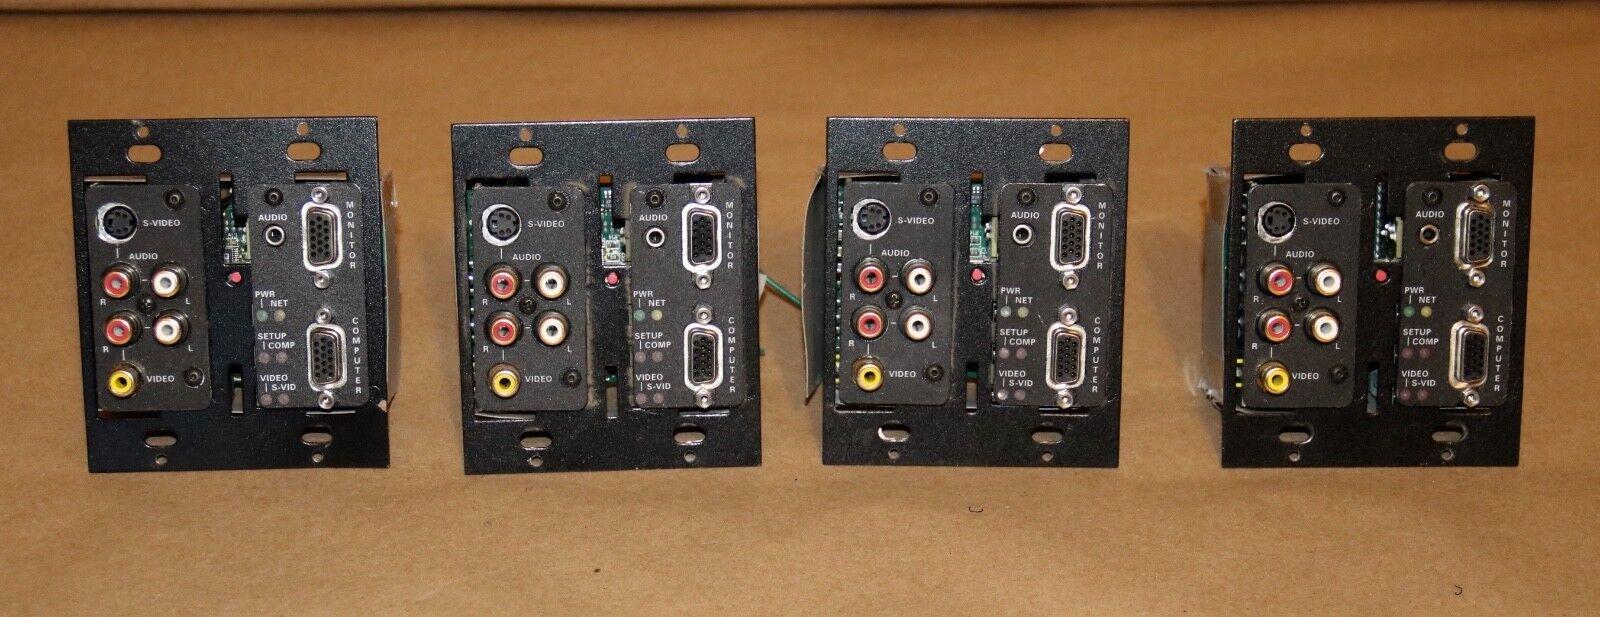 Crestron Electronics QM-WMC Quickmedia Wall Plate Media Center. Lot of 4